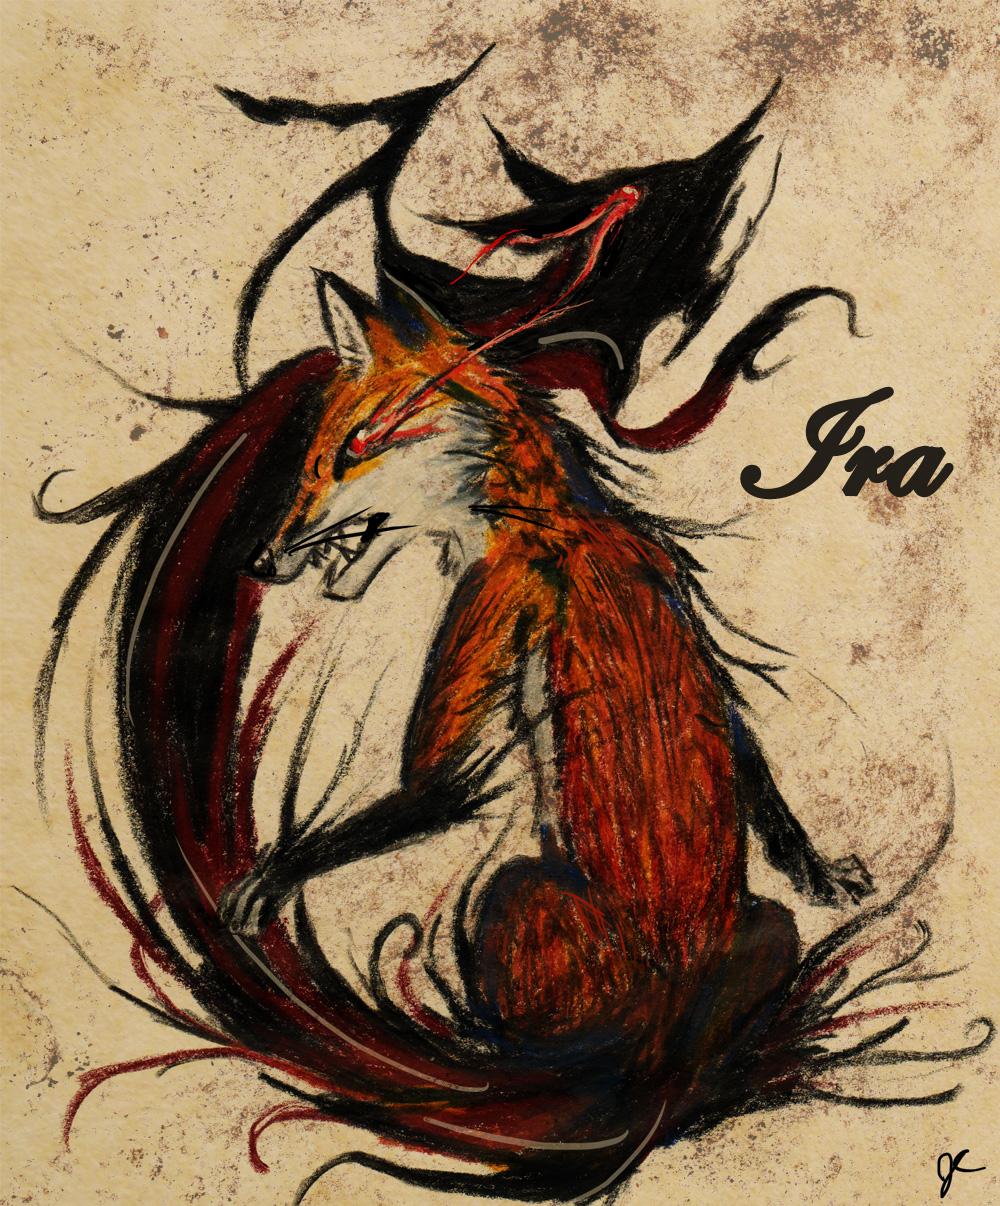 Ira:Wrath